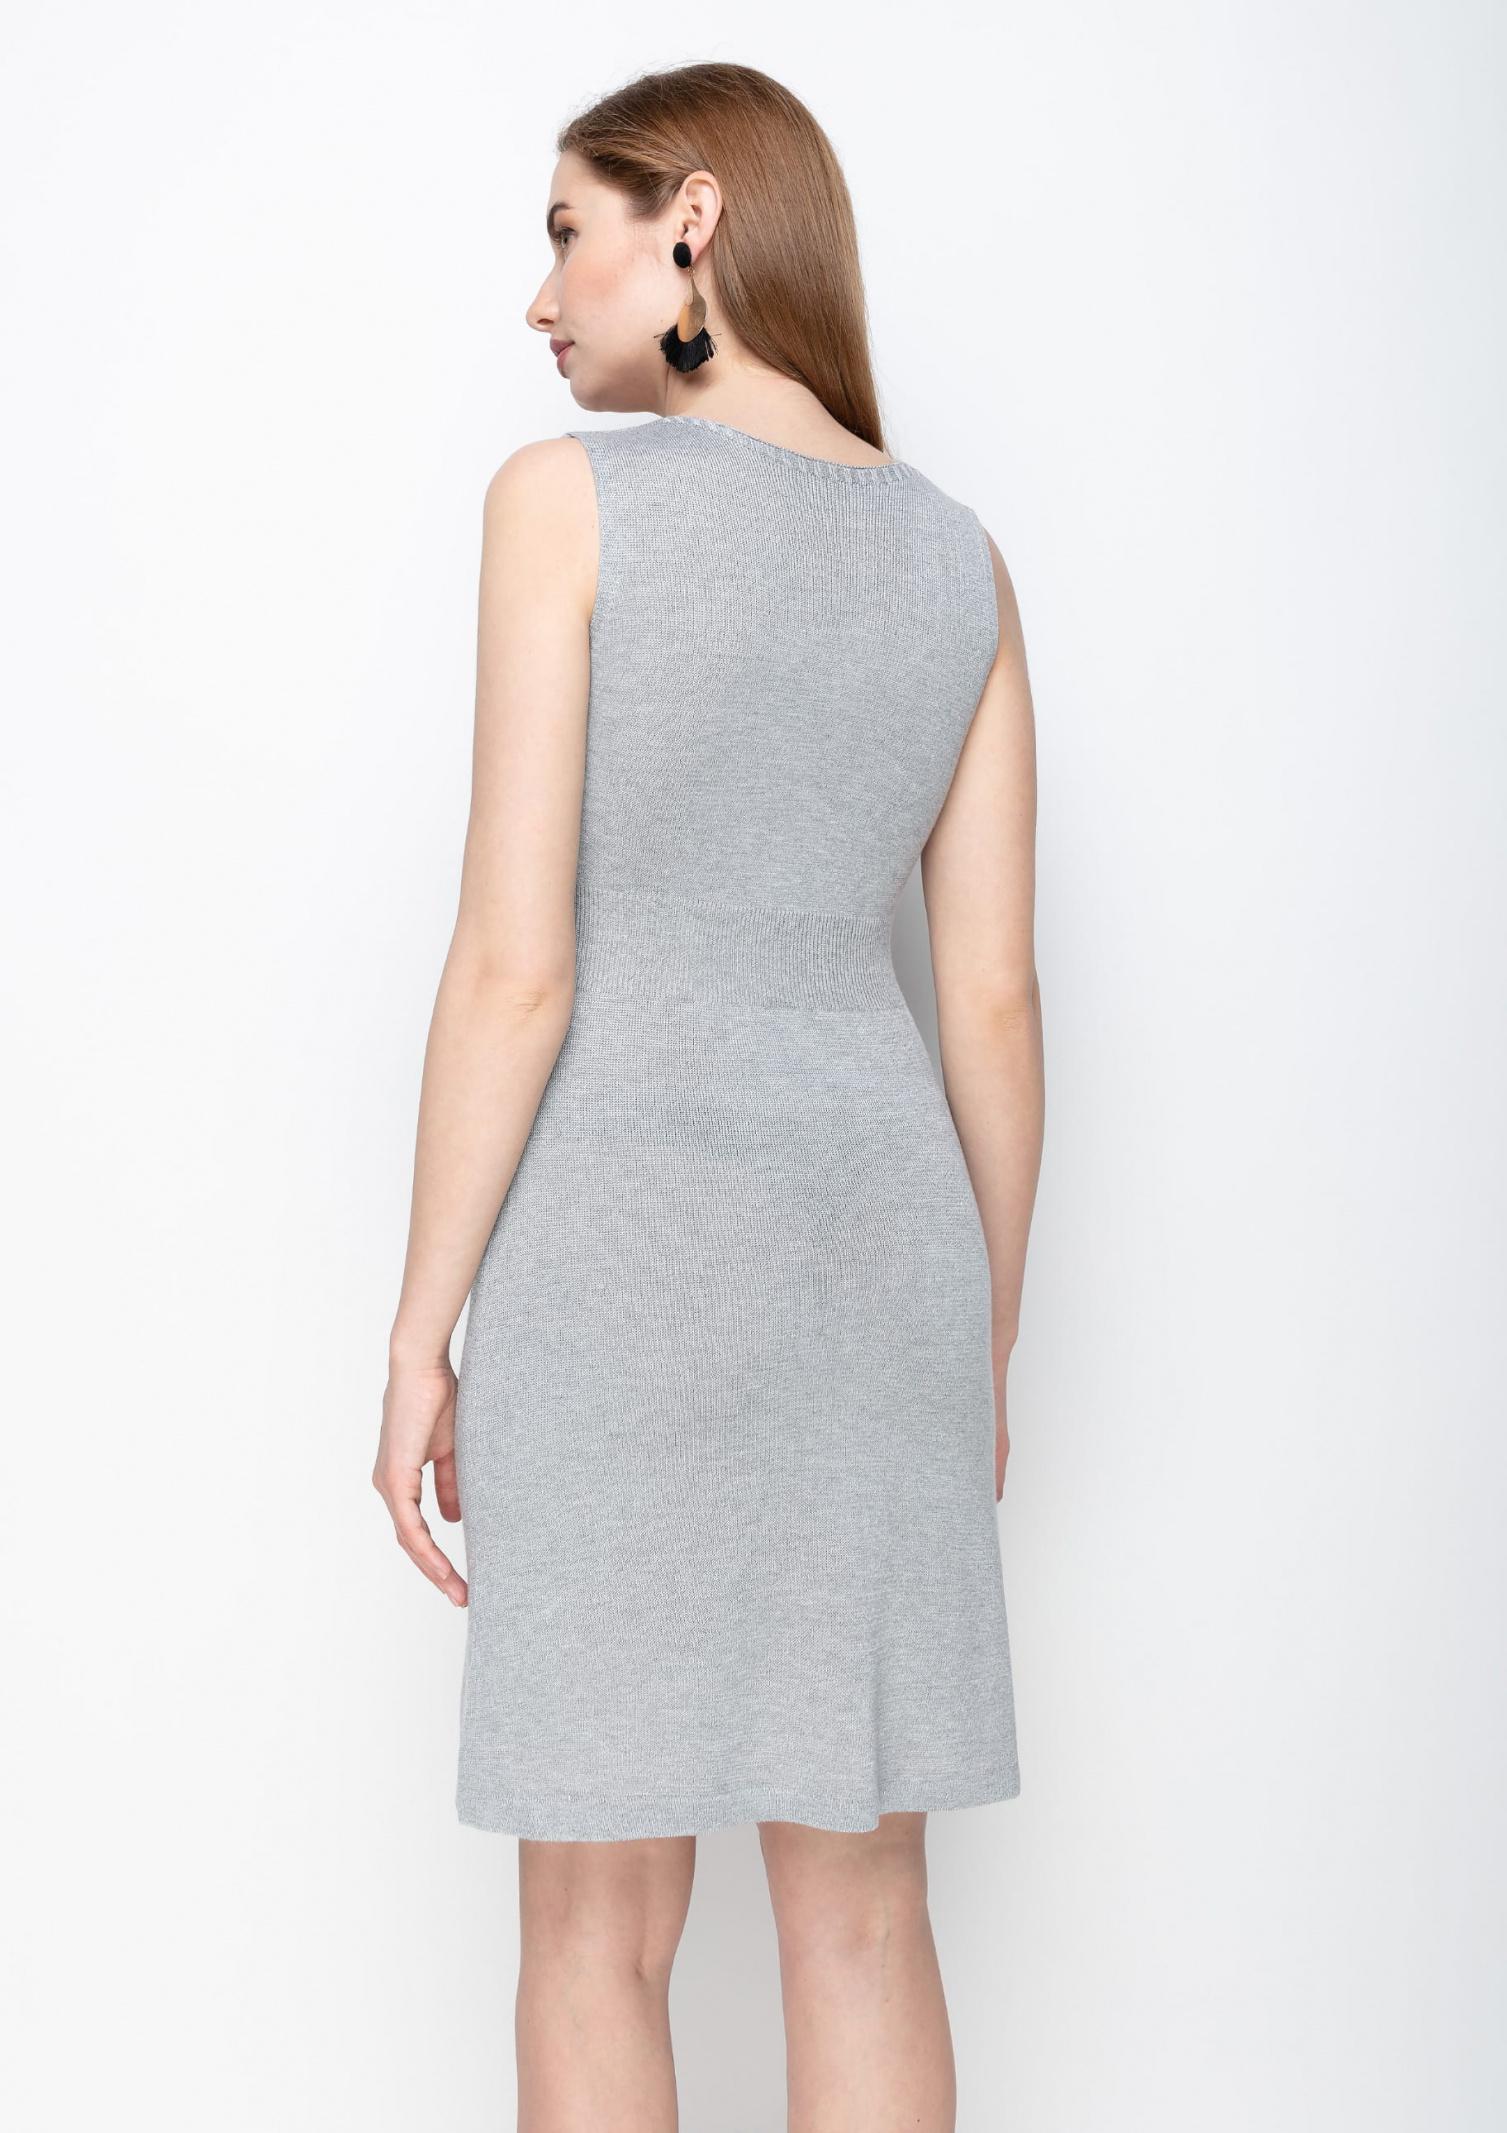 Samange Сукня жіночі модель 590-GIG_215 , 2017